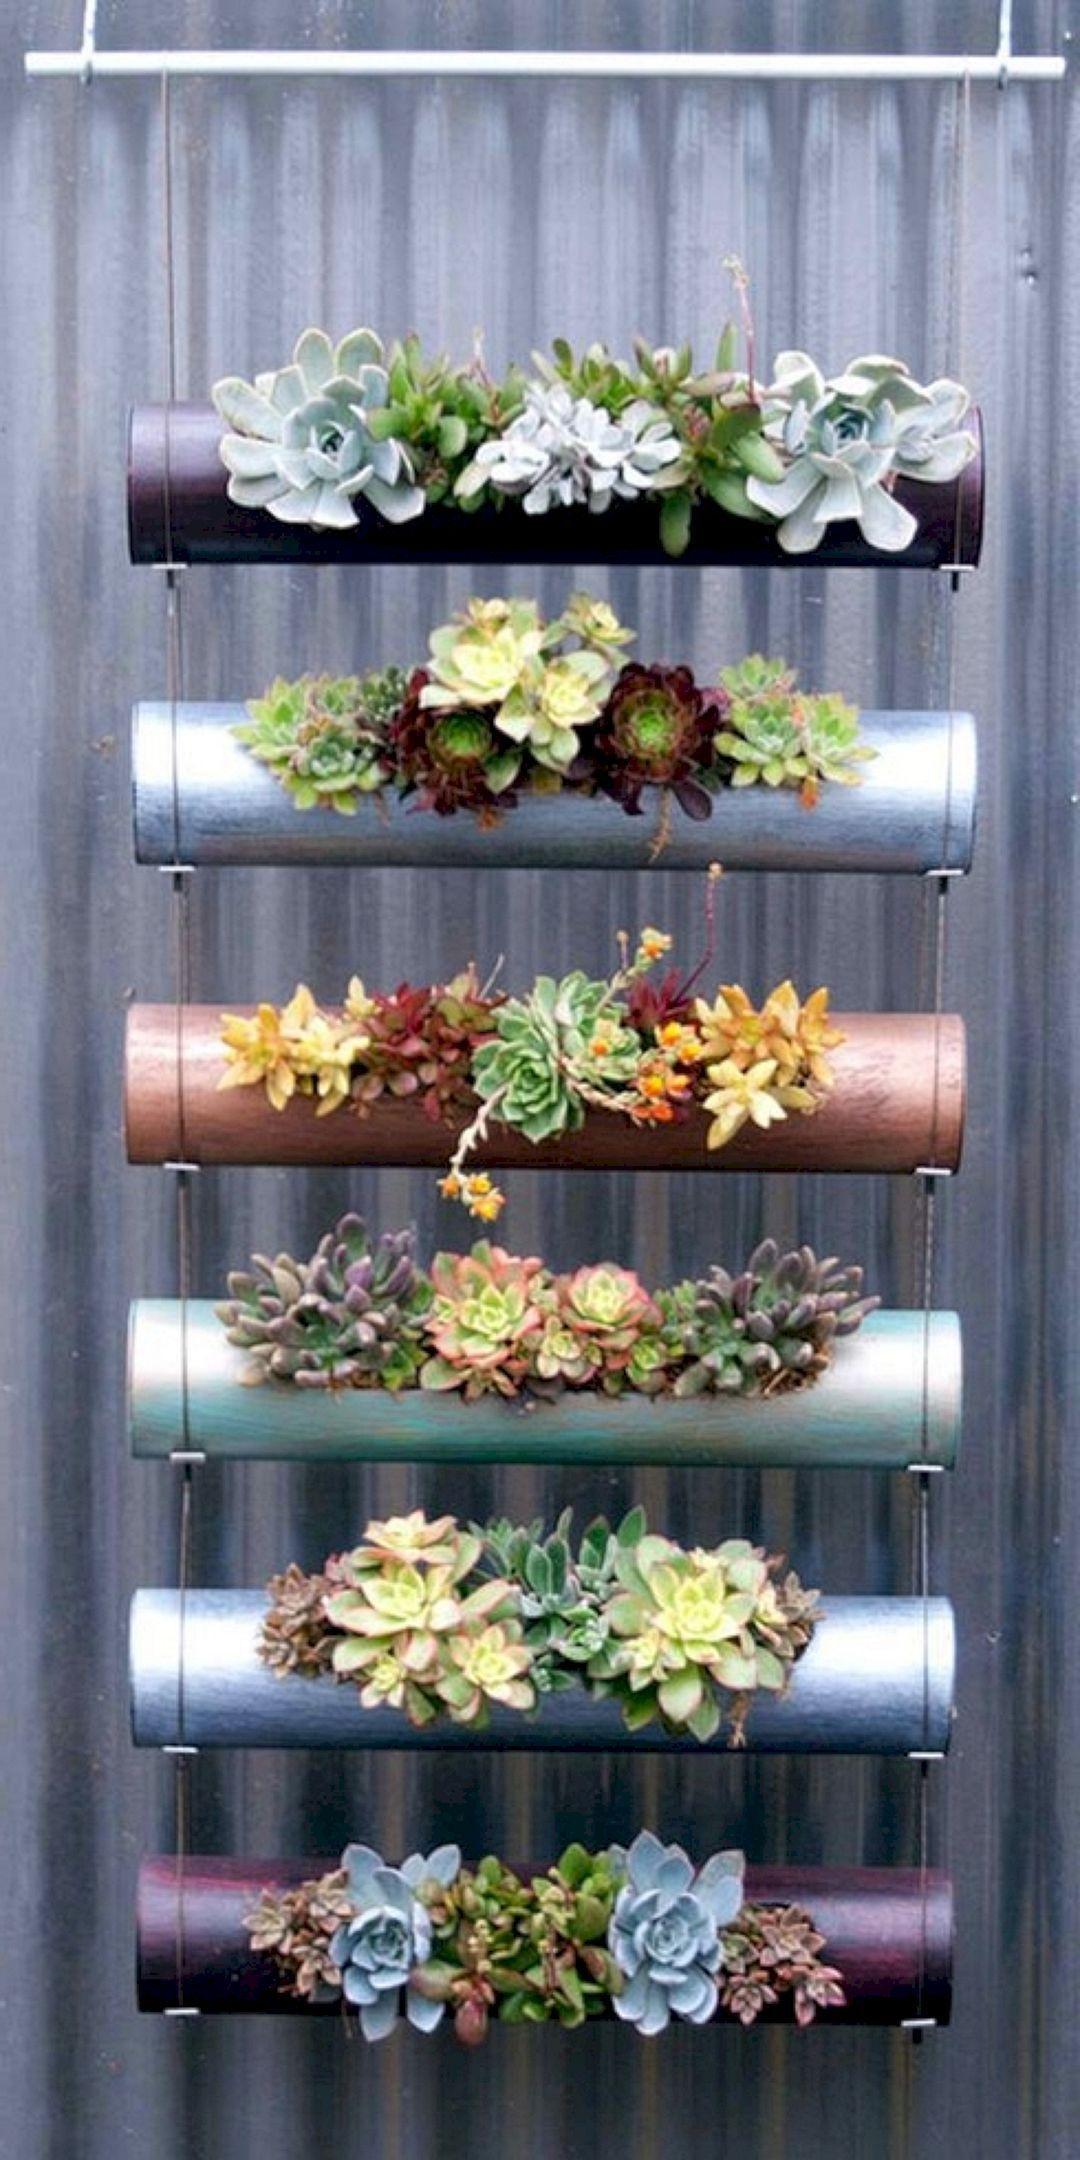 No best creative diy wall gardens outdoor inspirations on a